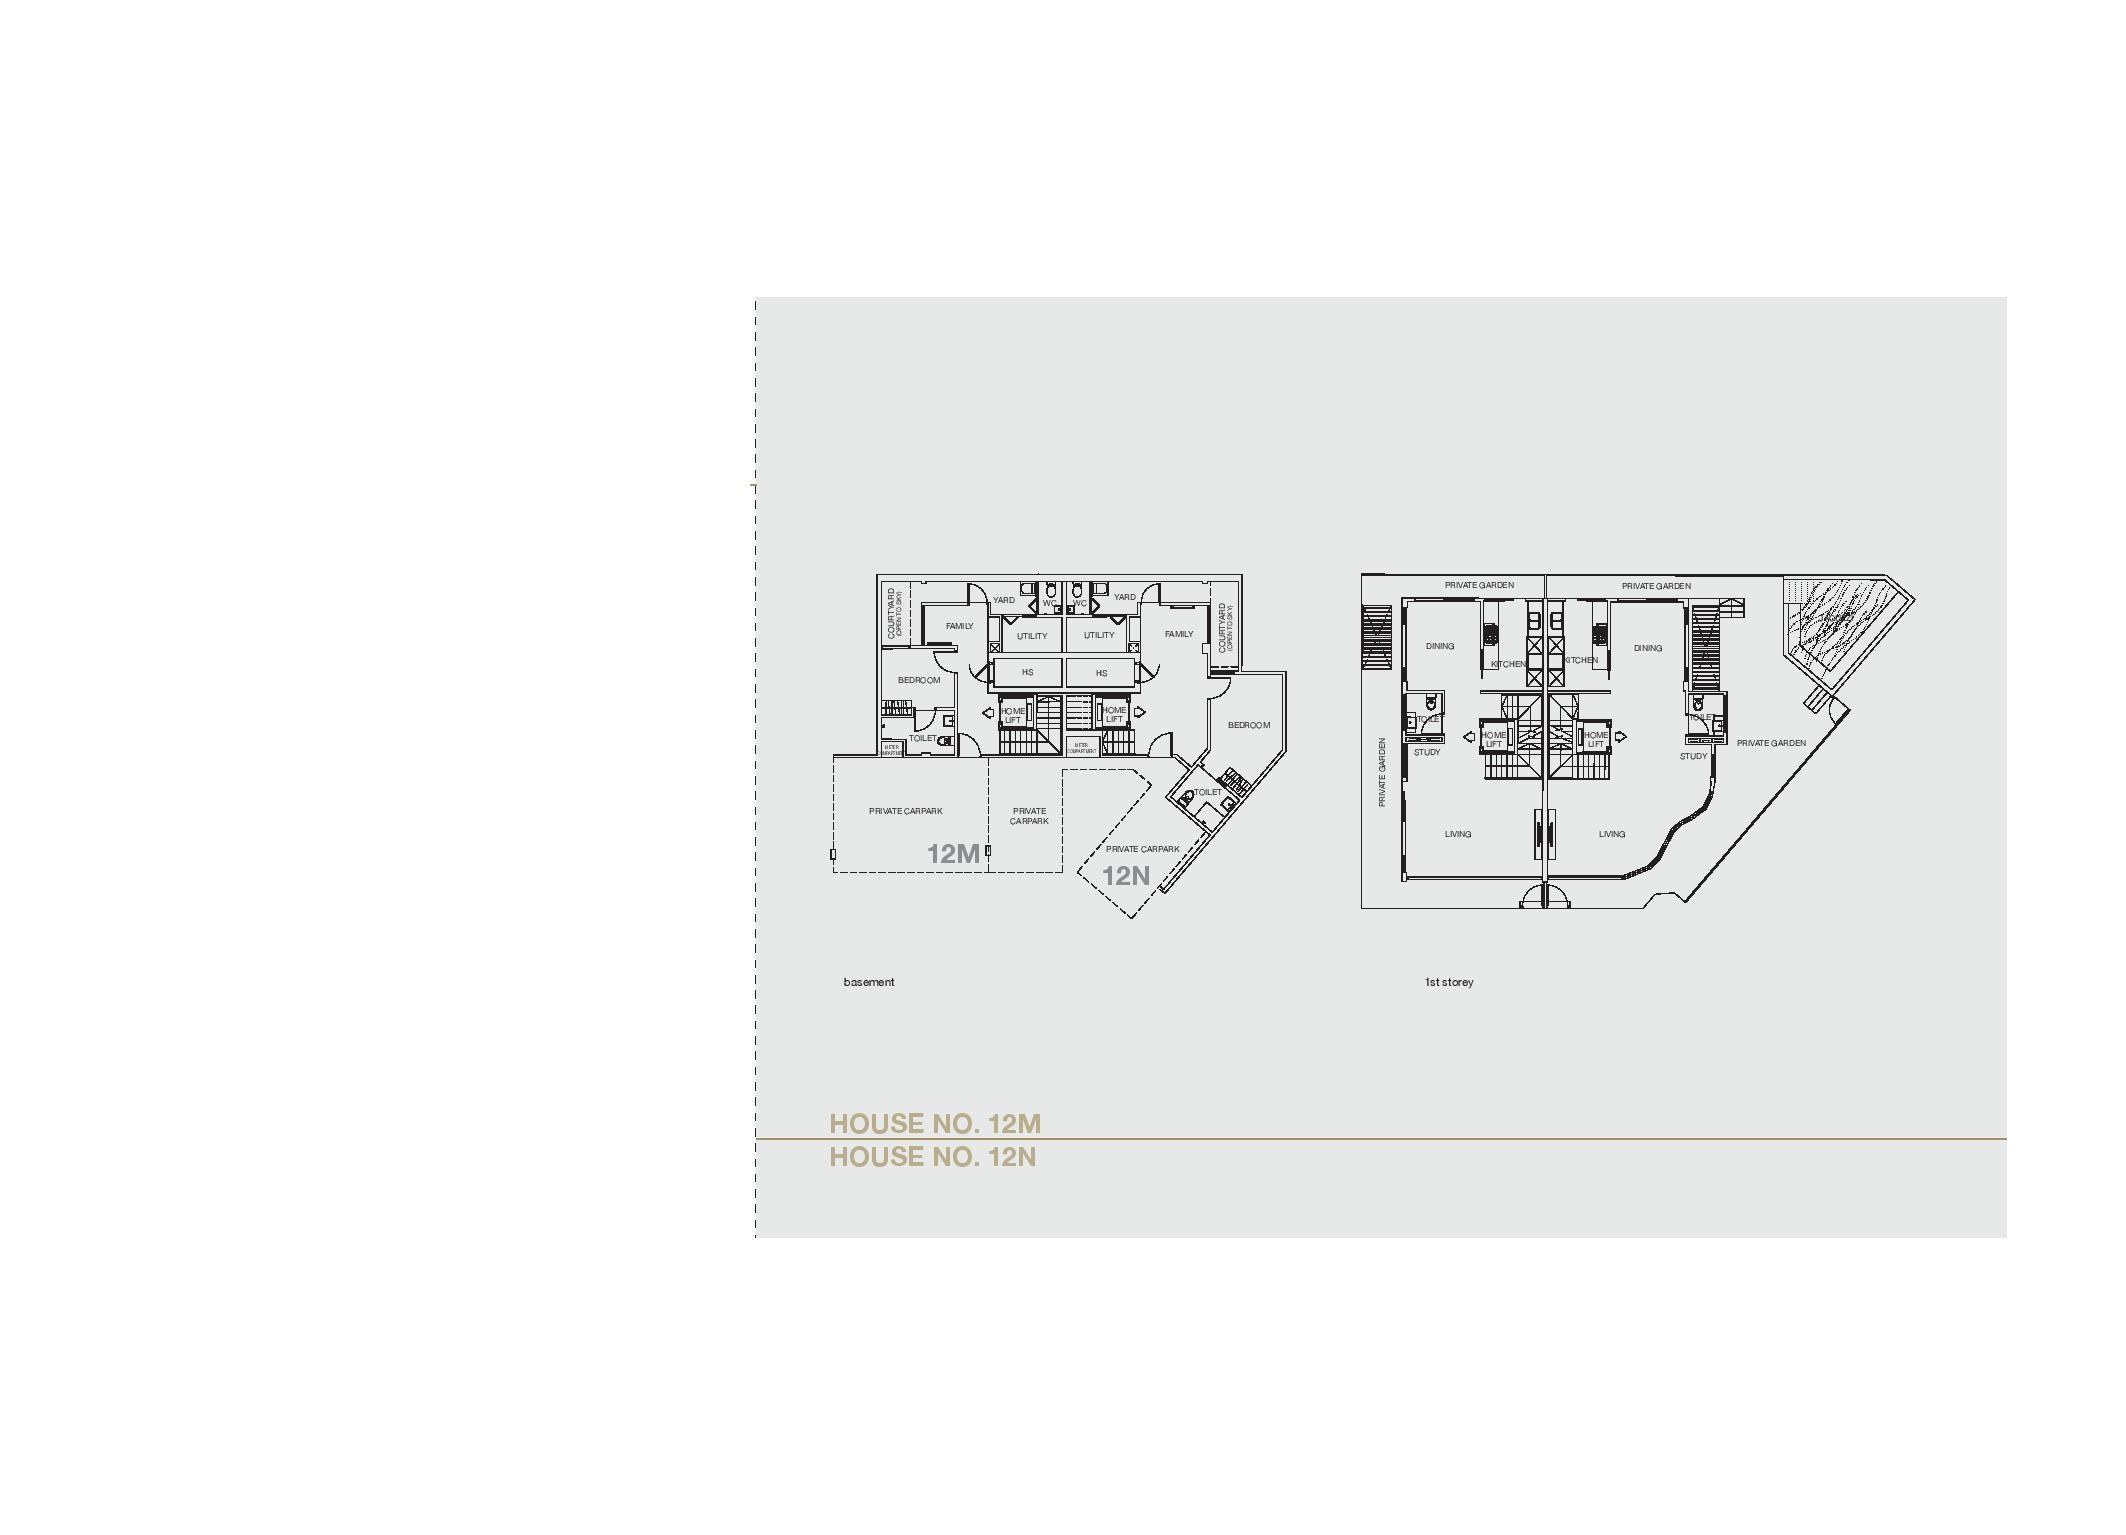 Chancery Hill Villas House 12M/12N Basement & 1st LevelFloor Plans